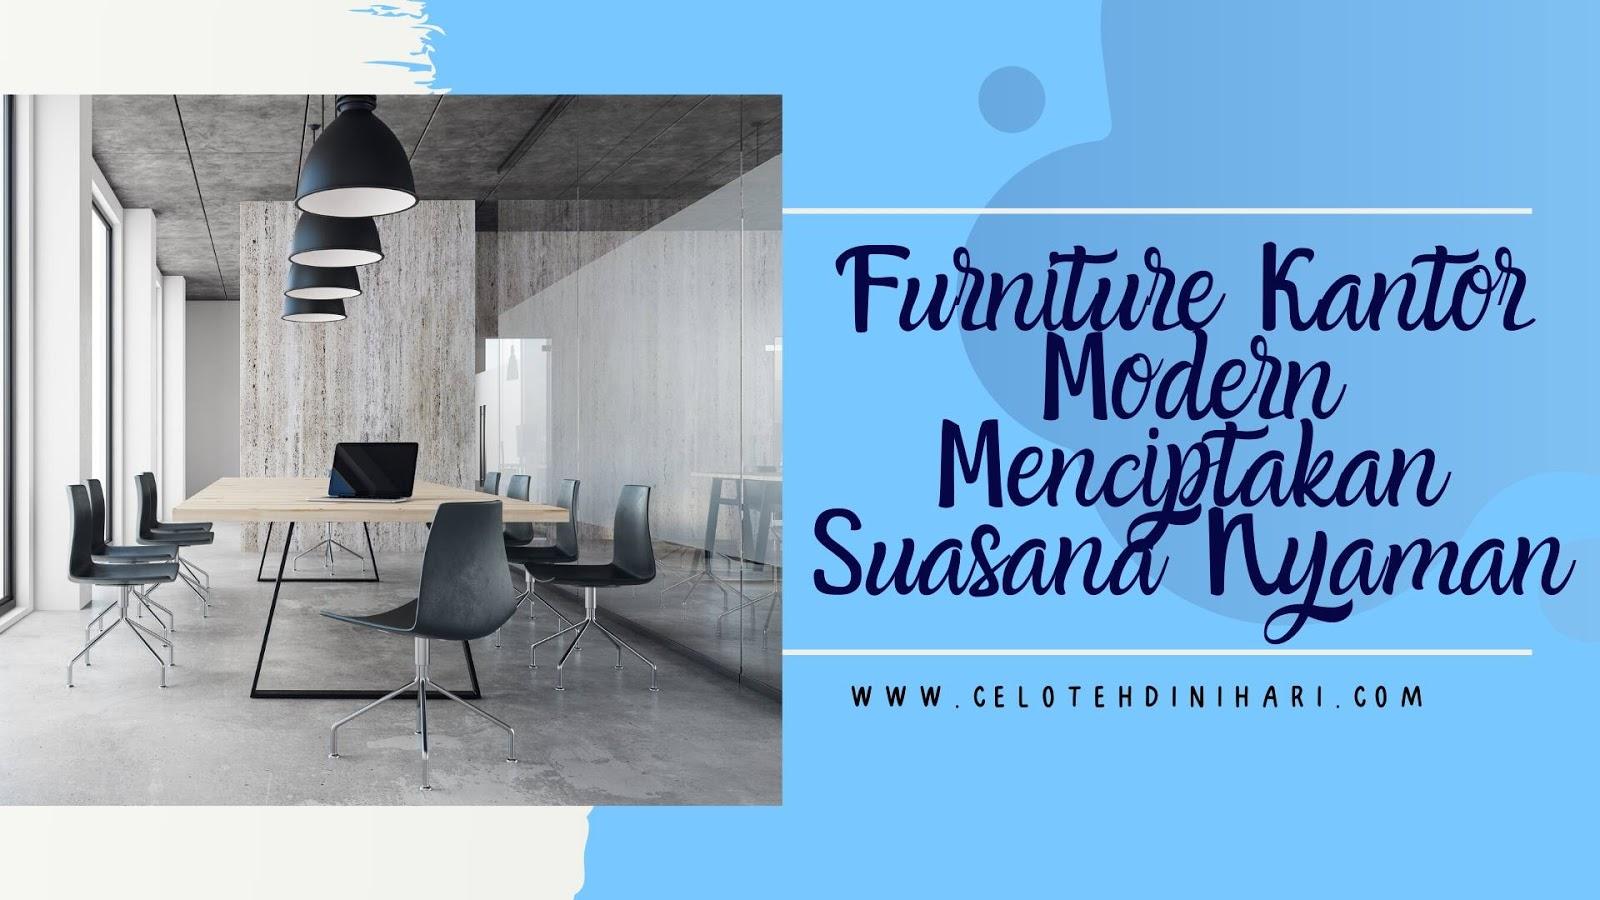 Furniture Kantor Modern Menciptakan Suasana Nyaman